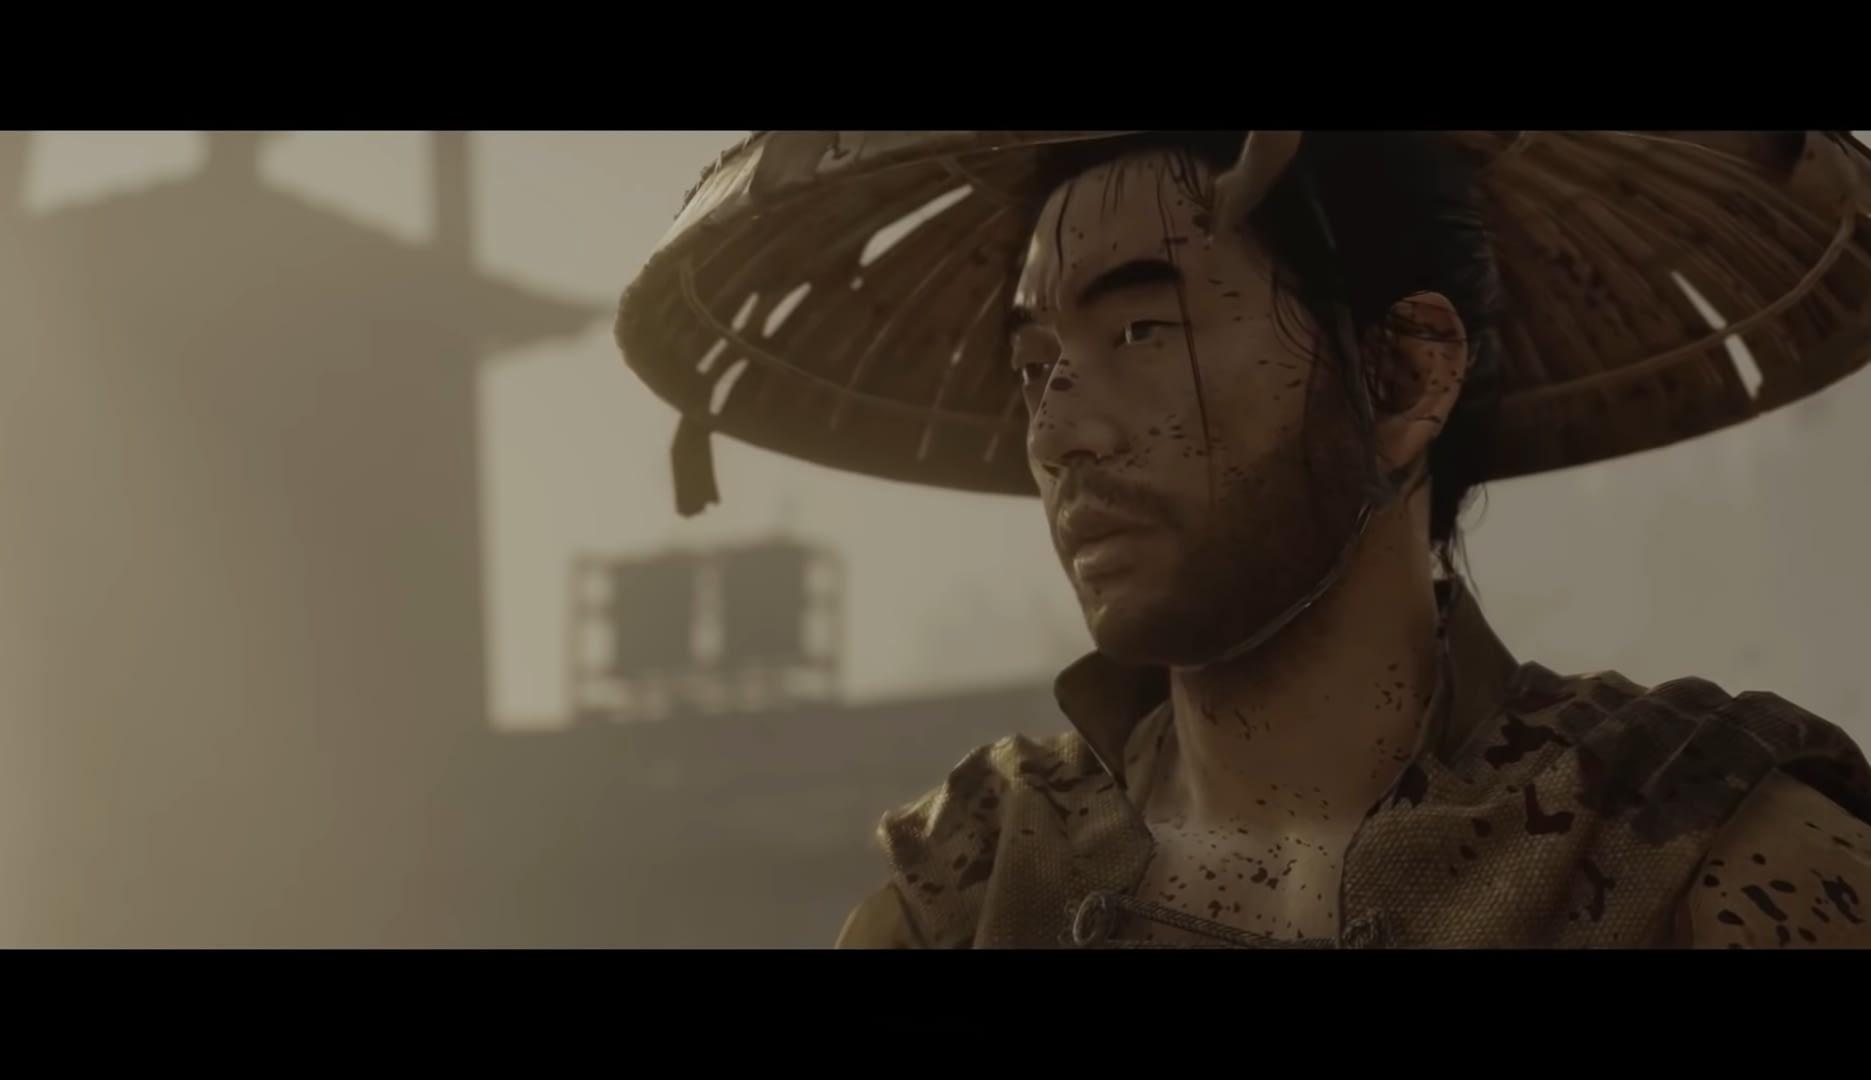 Jin : Ghost of Tsushima